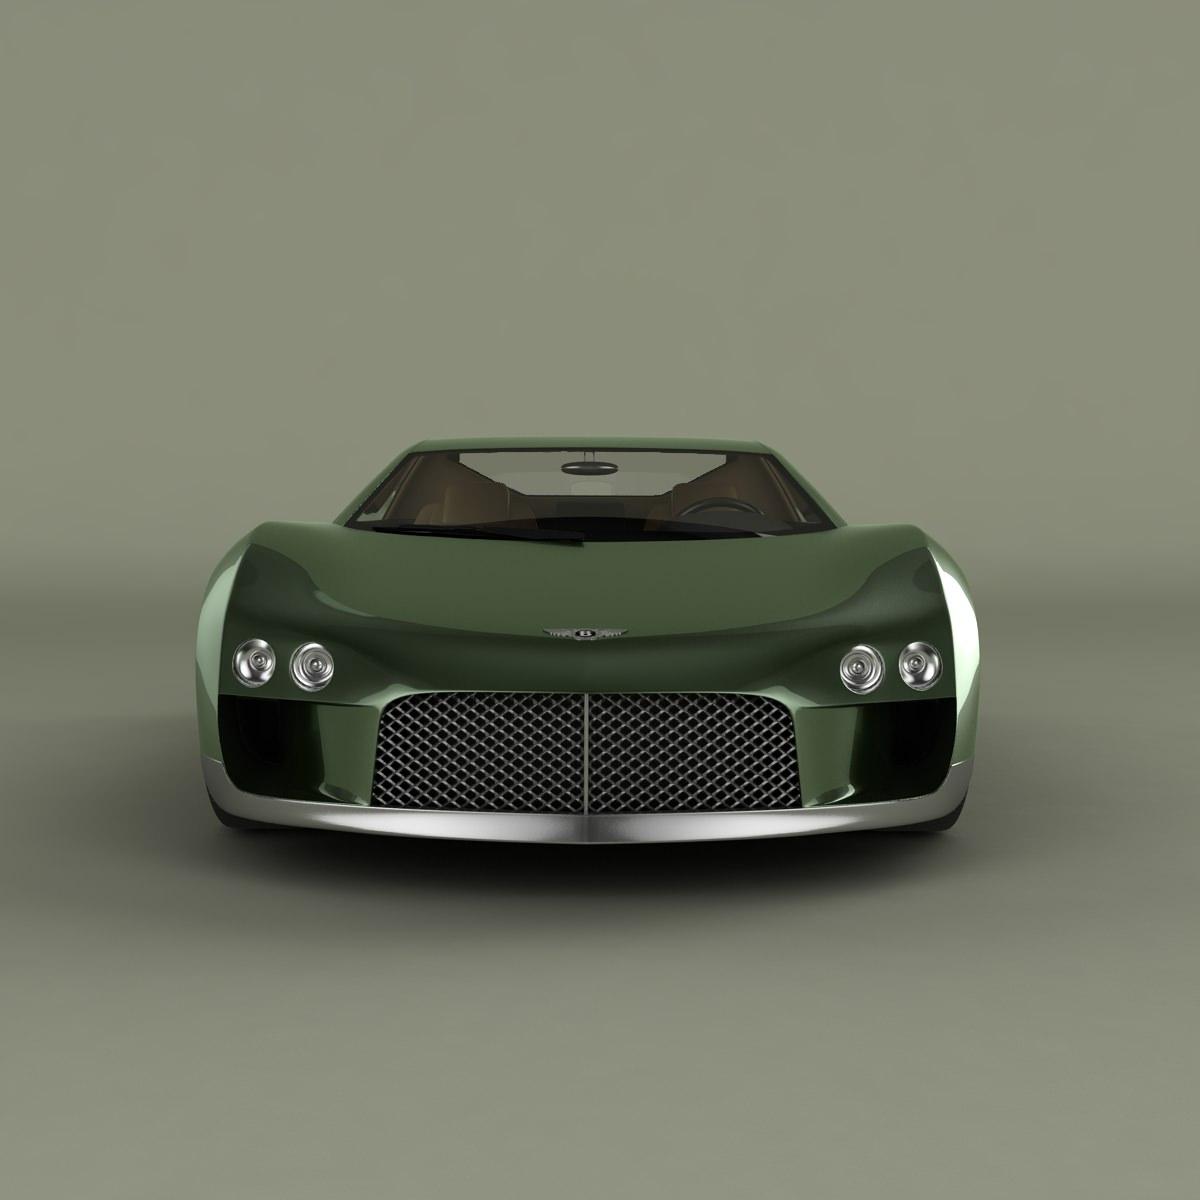 Bentley Hunaudieres Concept 3d Model Max Obj 3ds